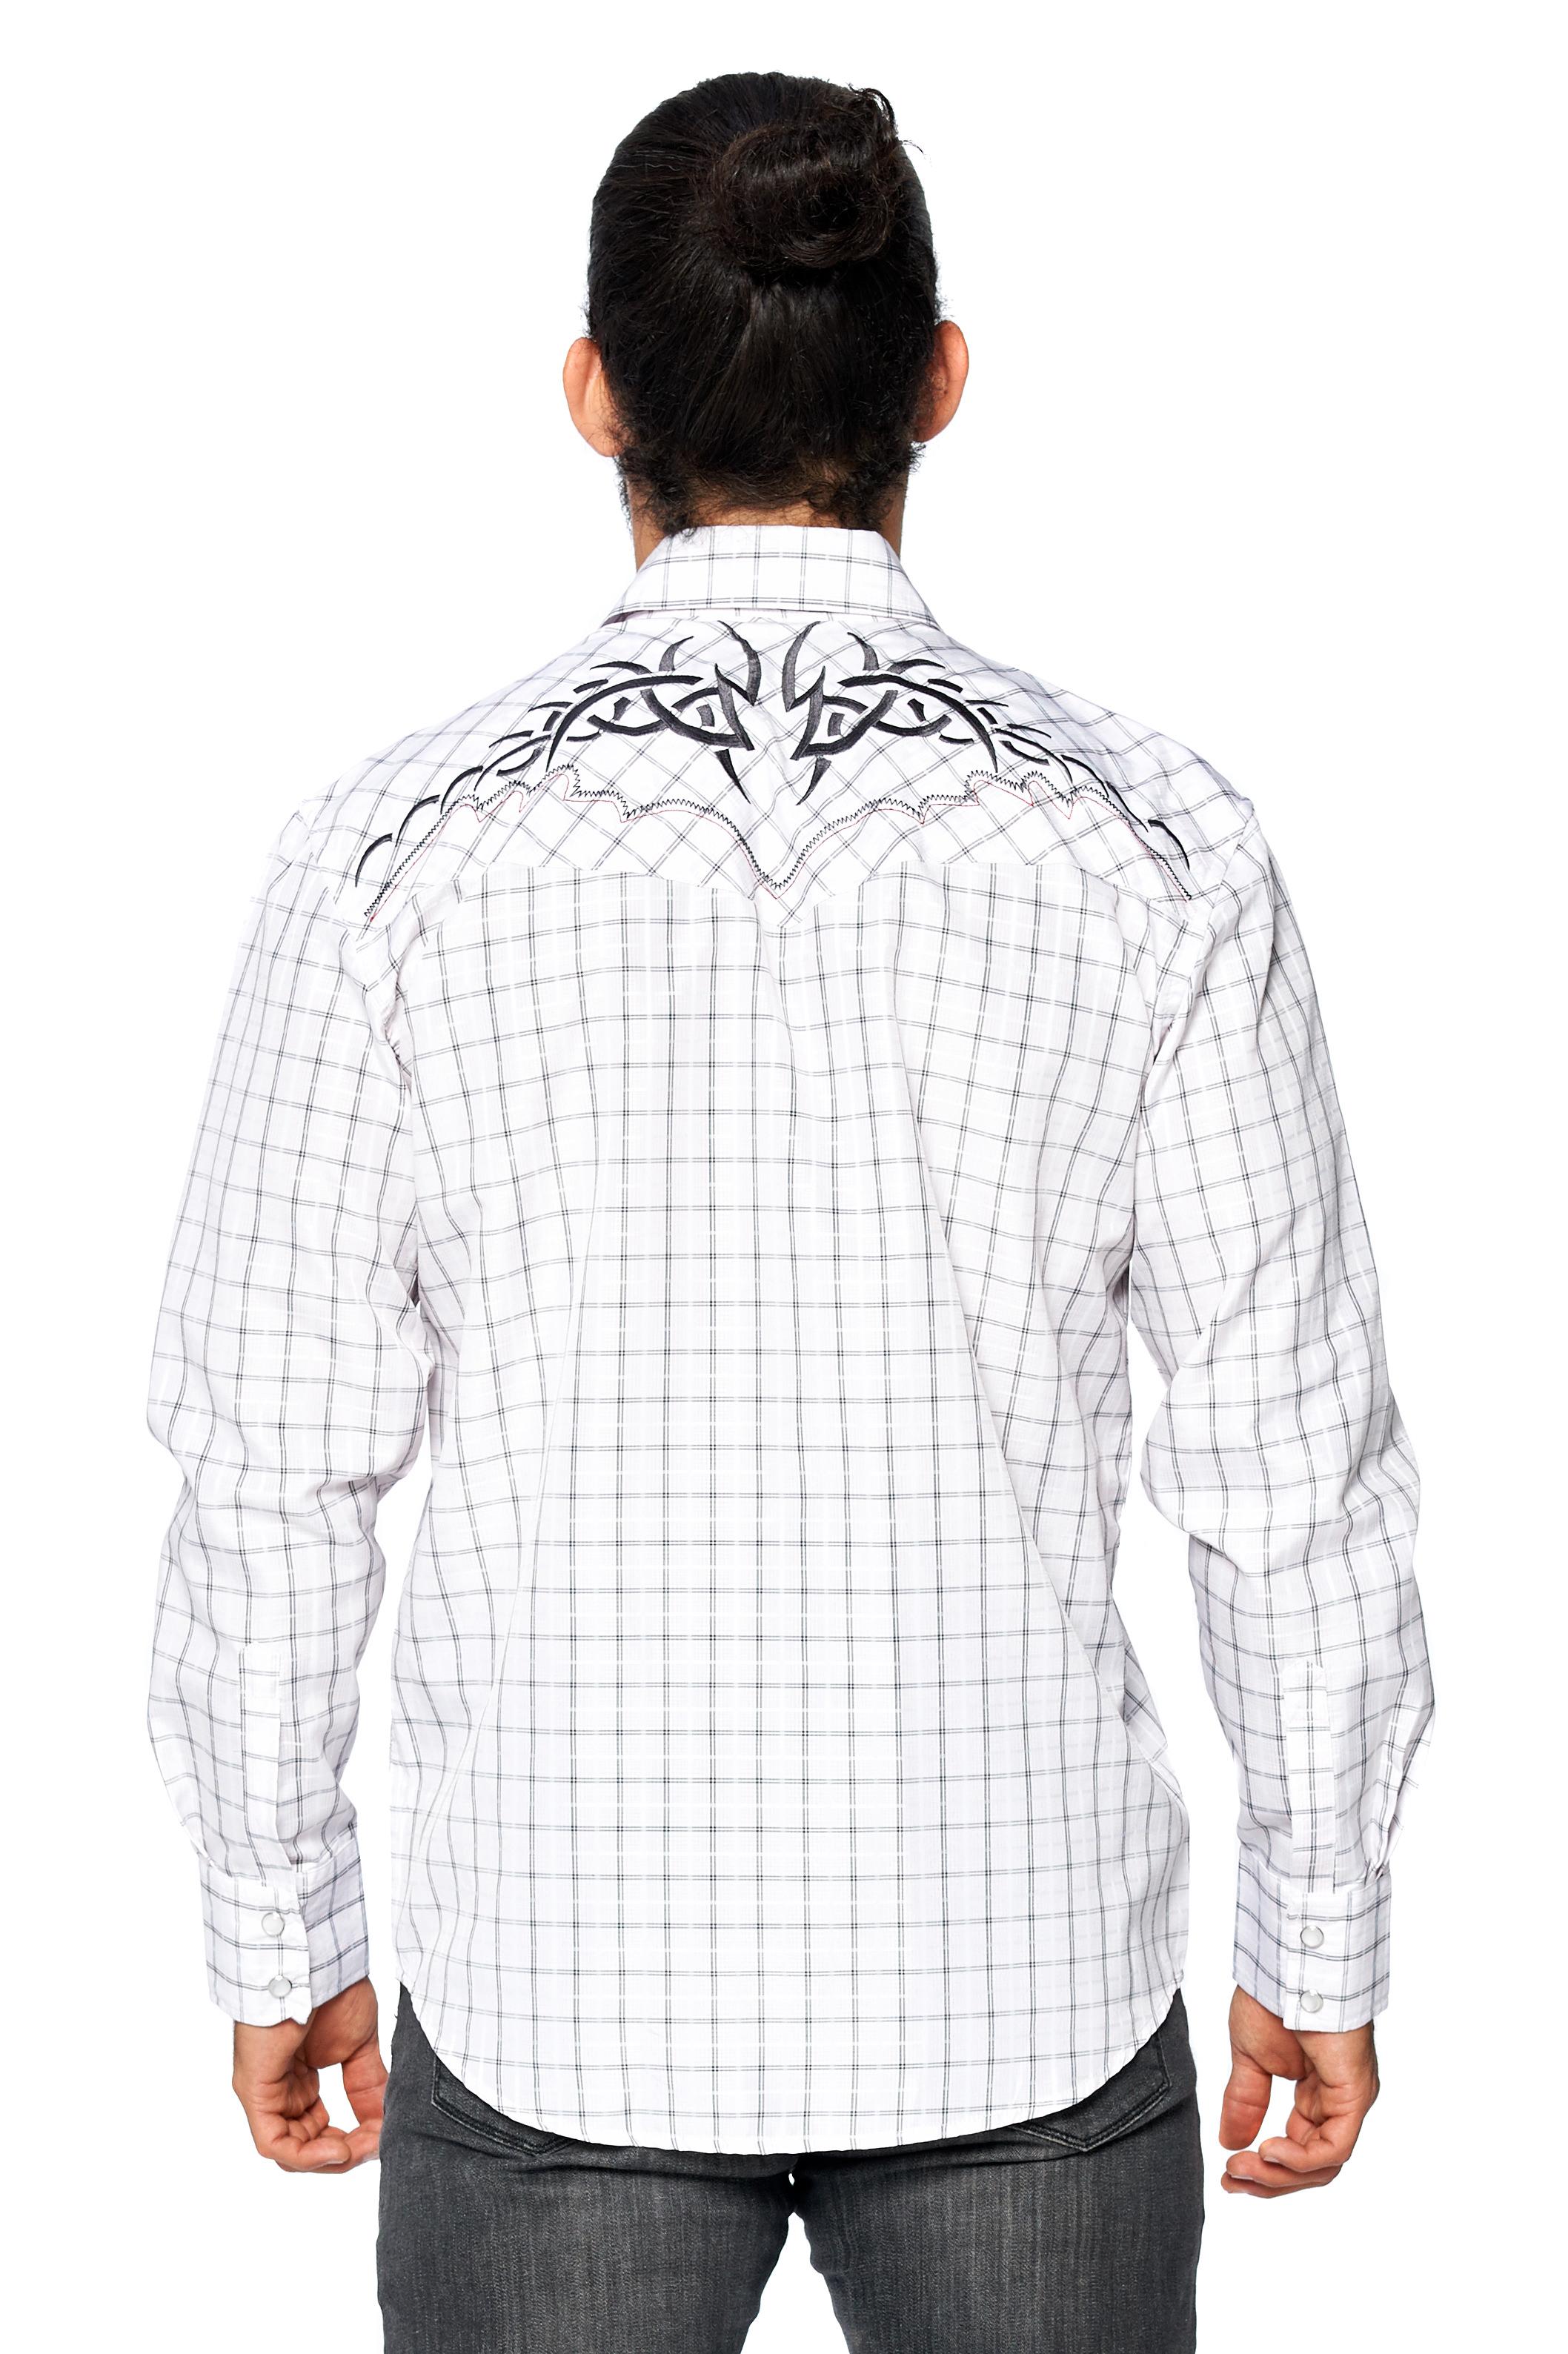 LW-Men-039-s-Pearl-Snap-Tribal-Stylish-Printed-Woven-Western-Vaquero-Rodeo-Shirt thumbnail 70